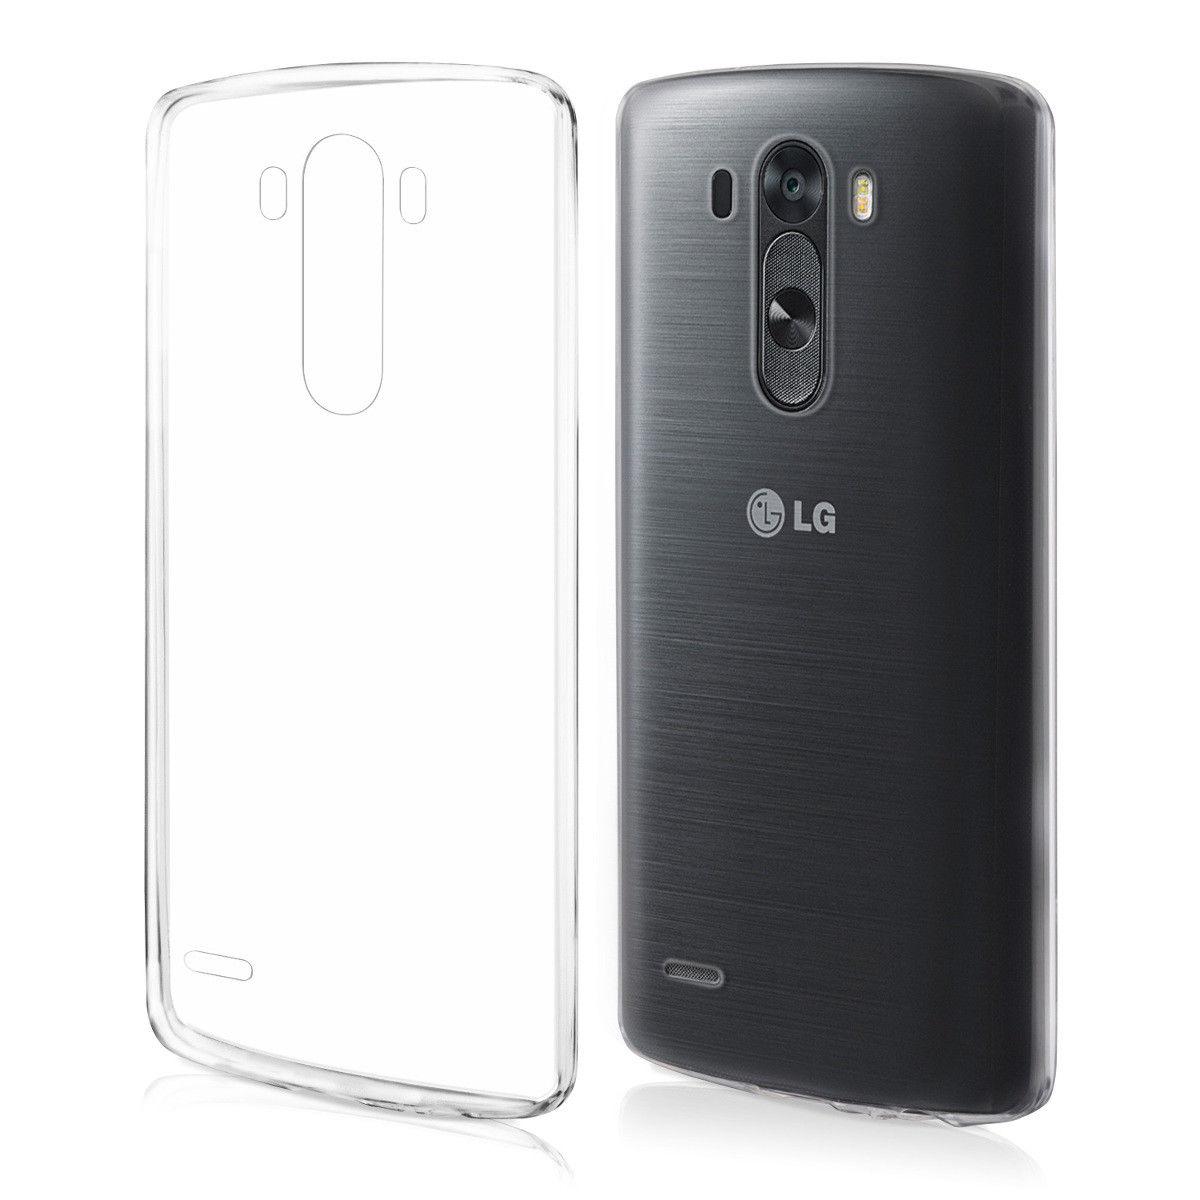 Pouzdro Mobilni Telefon Lg Zero Goospery G7 Thinq Plus Style Lux Jelly Case Green Gel Pro G3